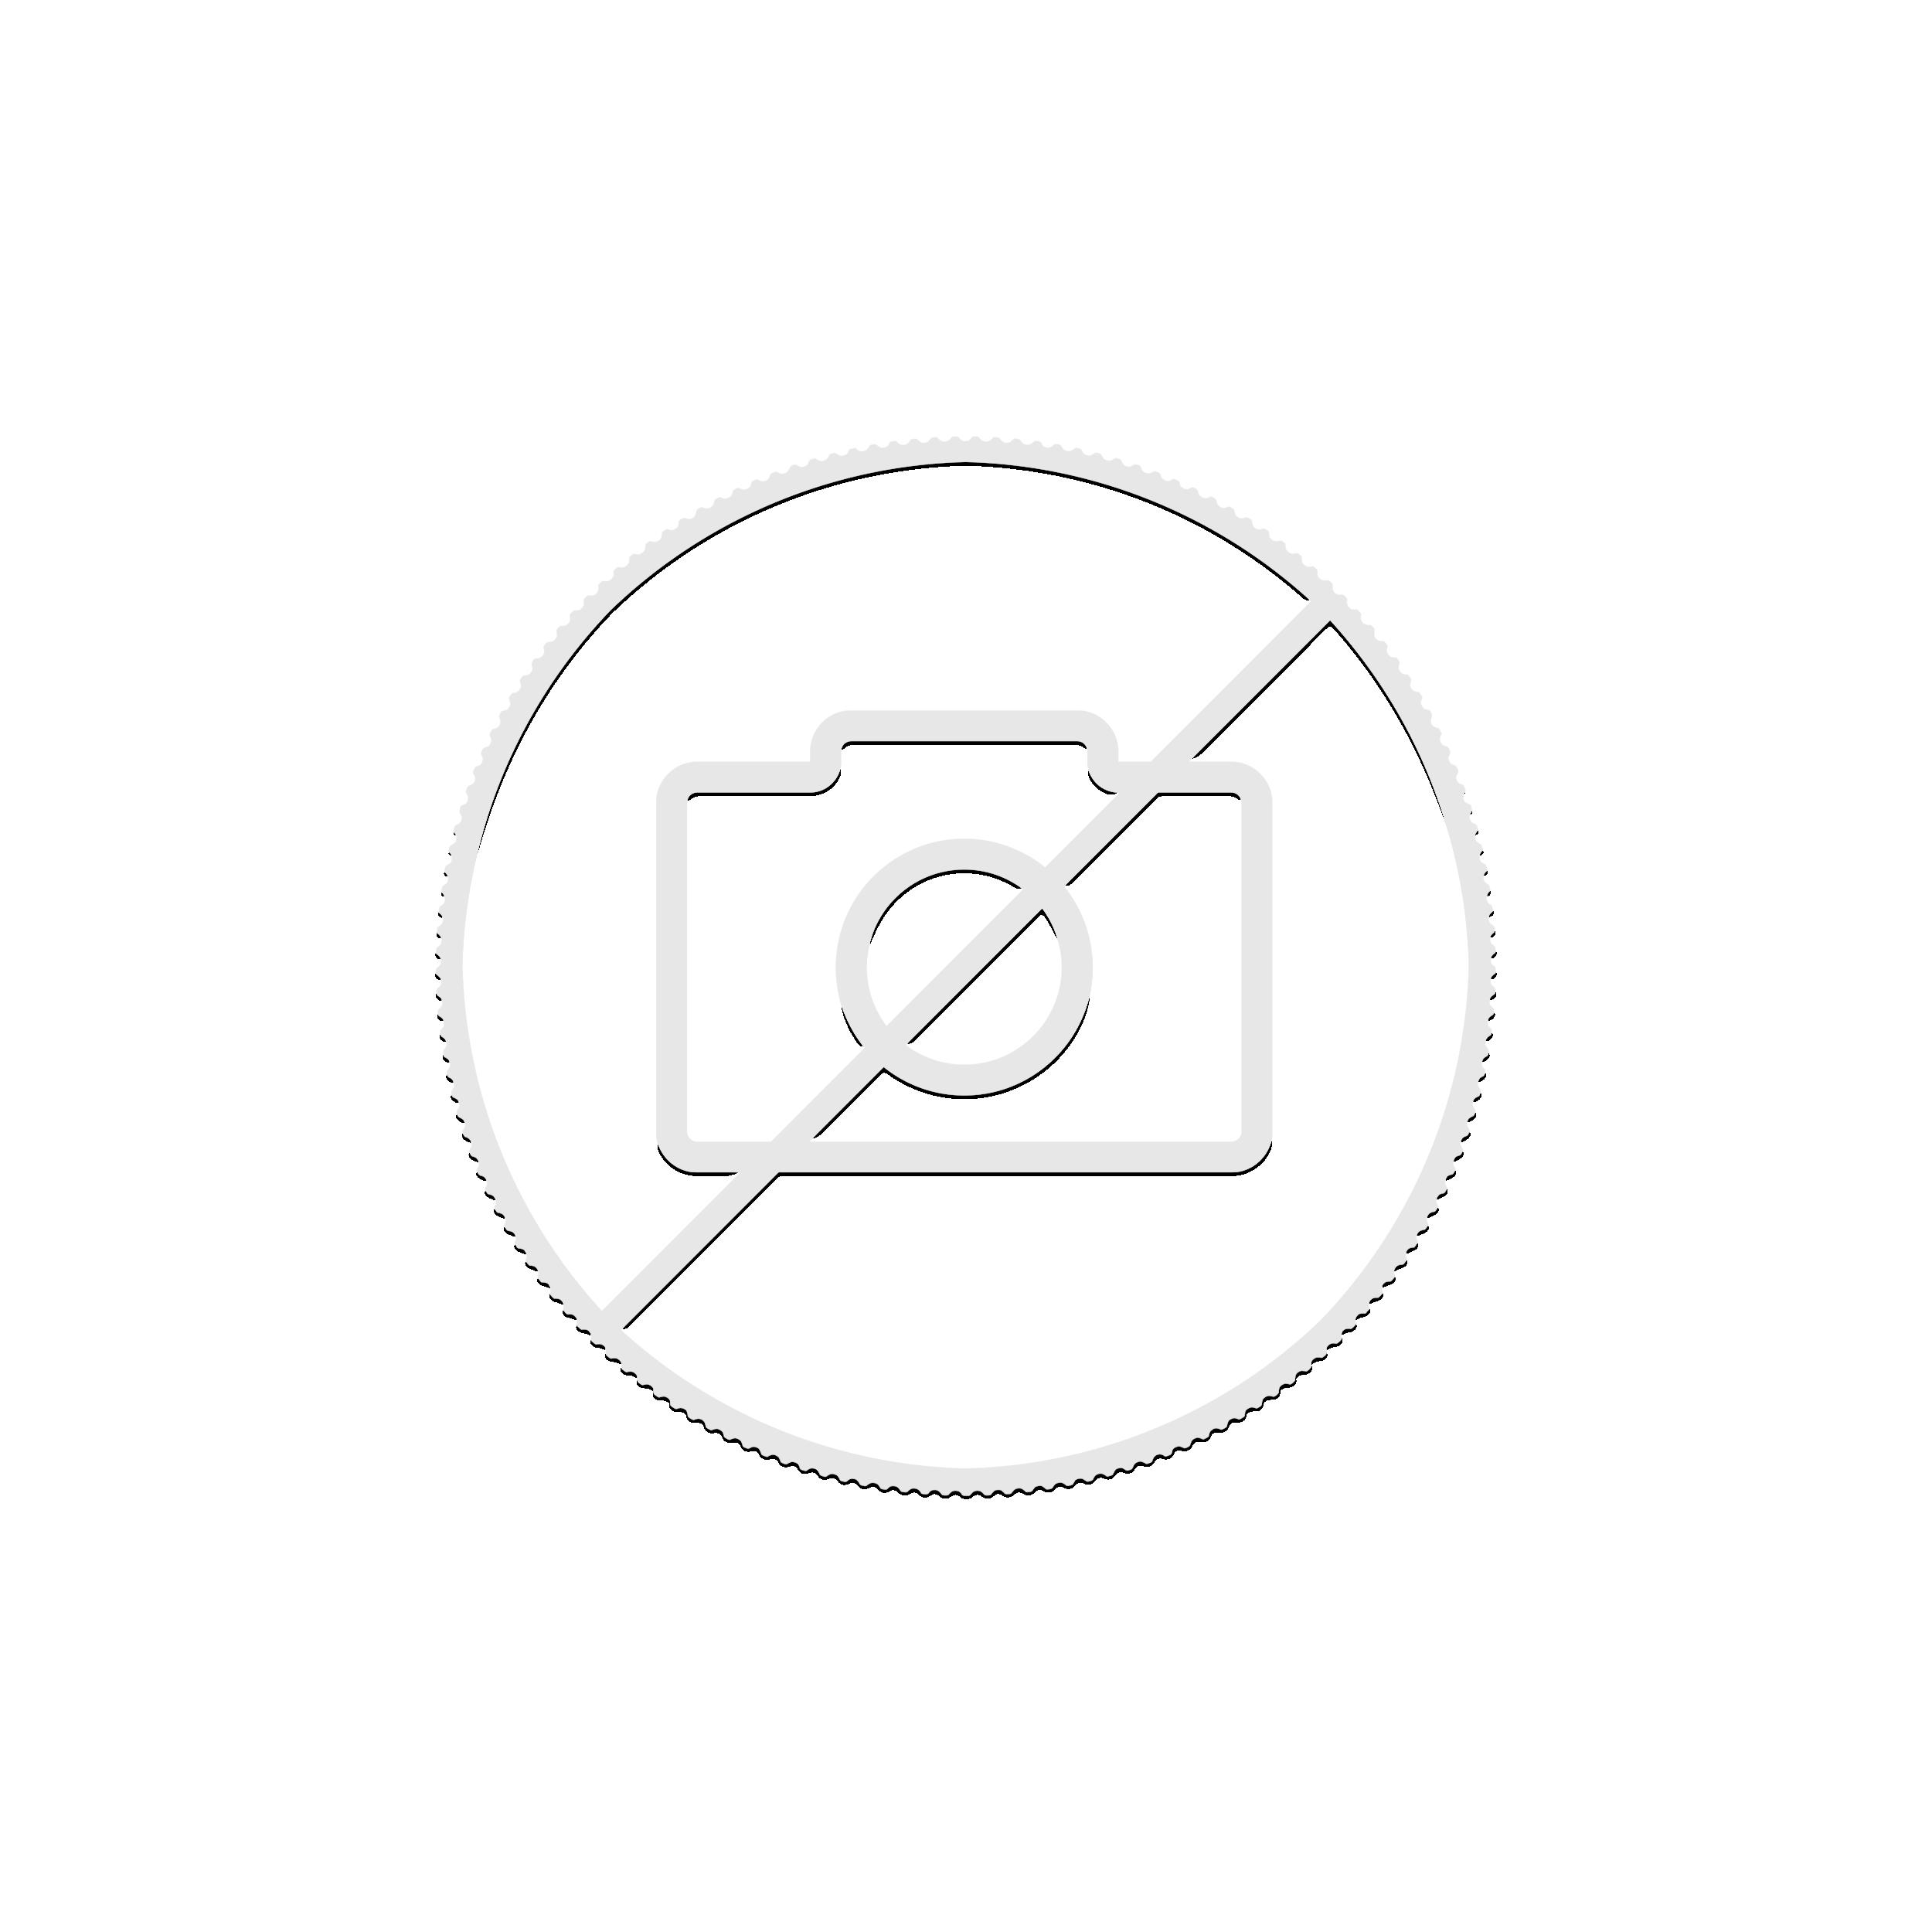 Gold ten guilder coin 2002 - Marriage